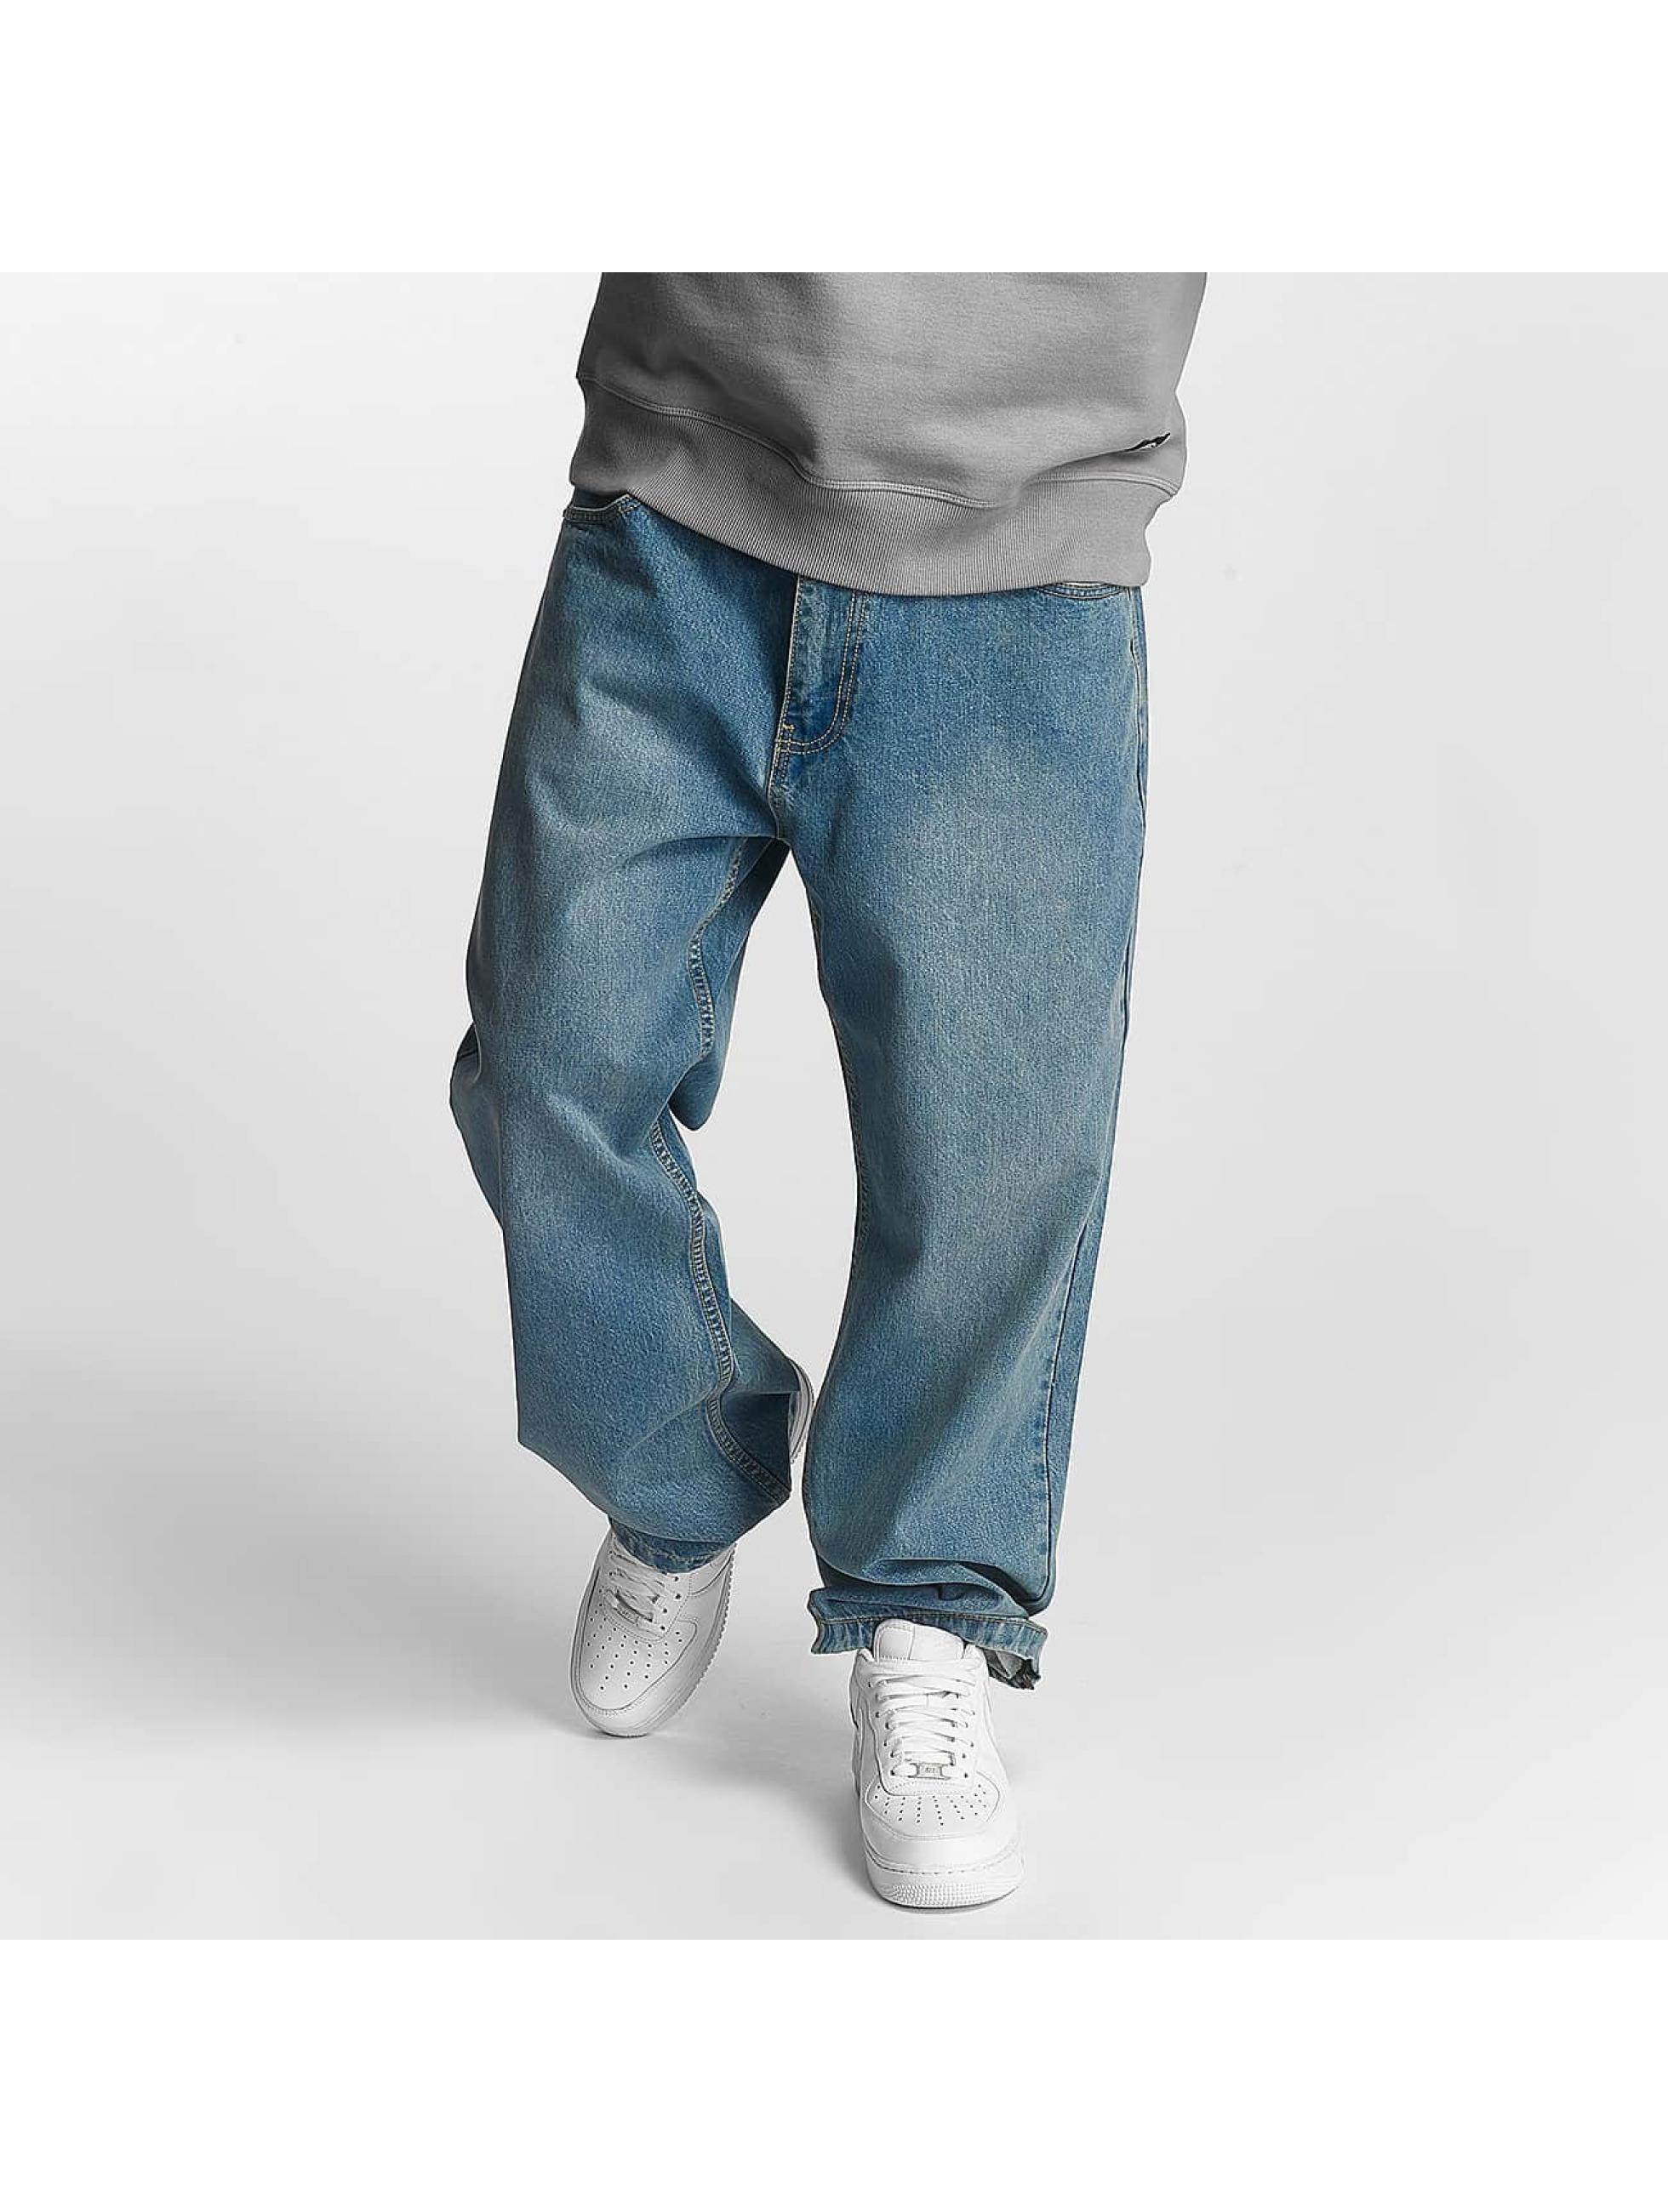 Ecko Unltd. / Loose Fit Jeans Camp's Lo Loose Fit in blue W 42 L 34